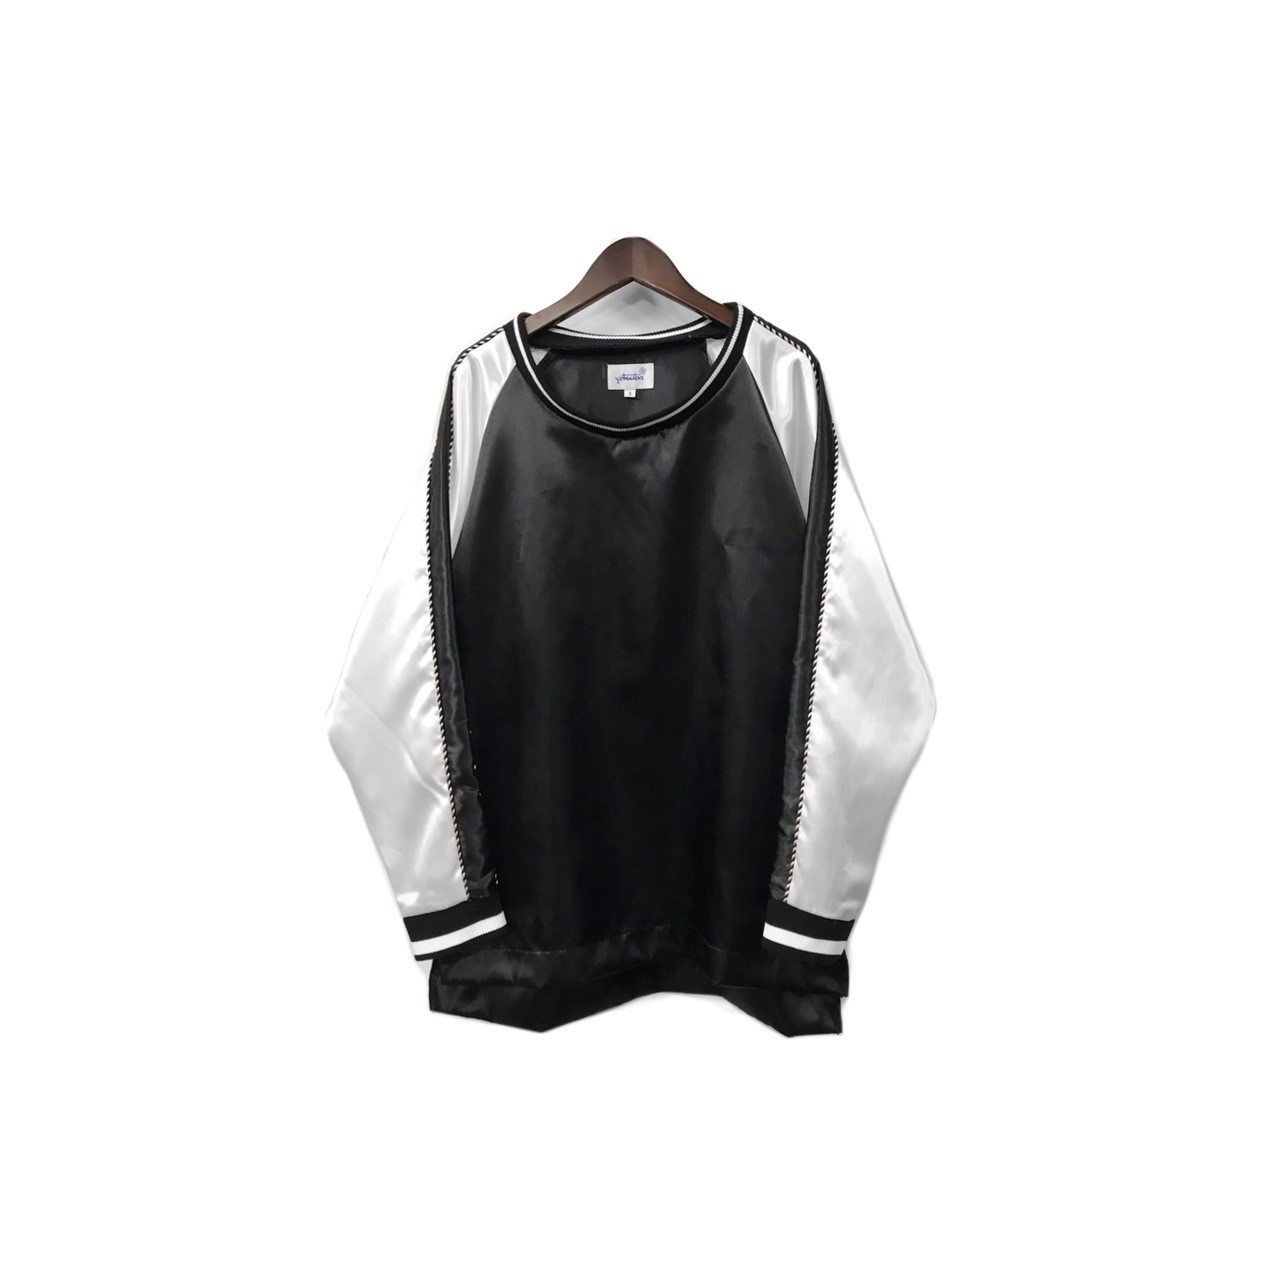 yotsuba - Souvenir Pullover Tops / Black ¥18000+tax